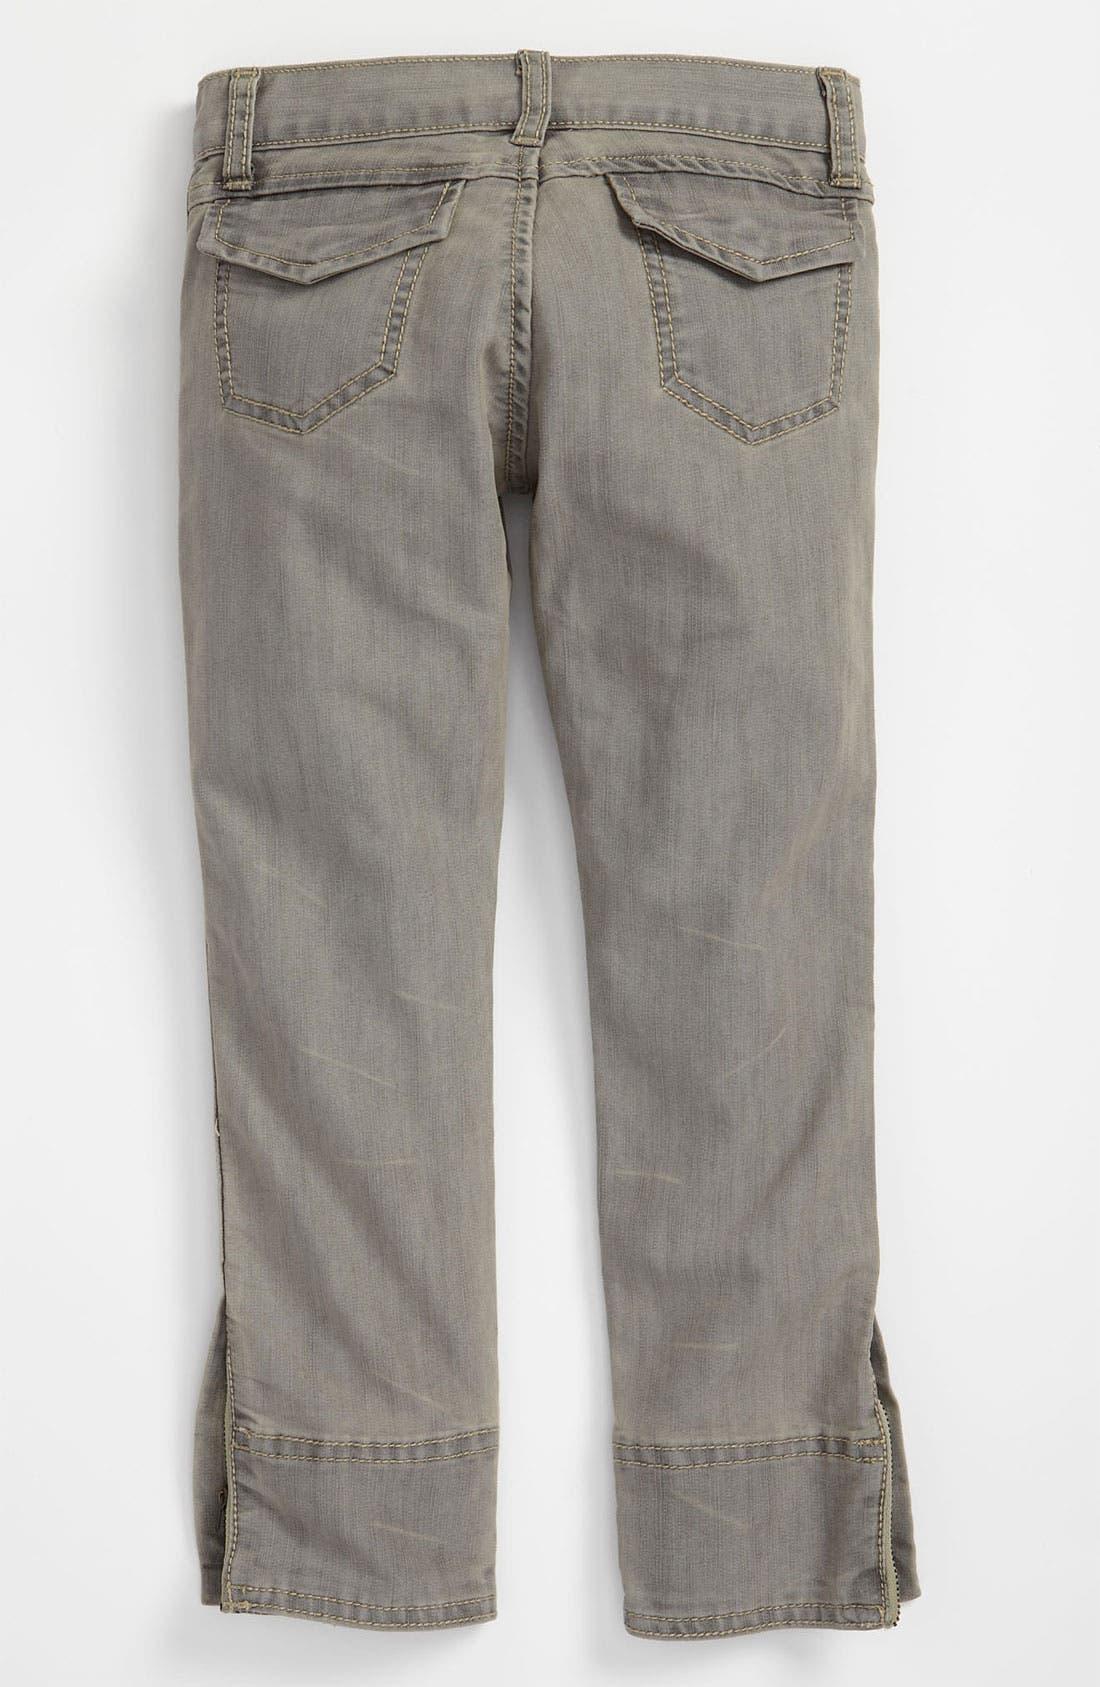 Alternate Image 1 Selected - Peek 'Sabrina' Straight Leg Pants (Toddler, Little Girls & Big Girls)